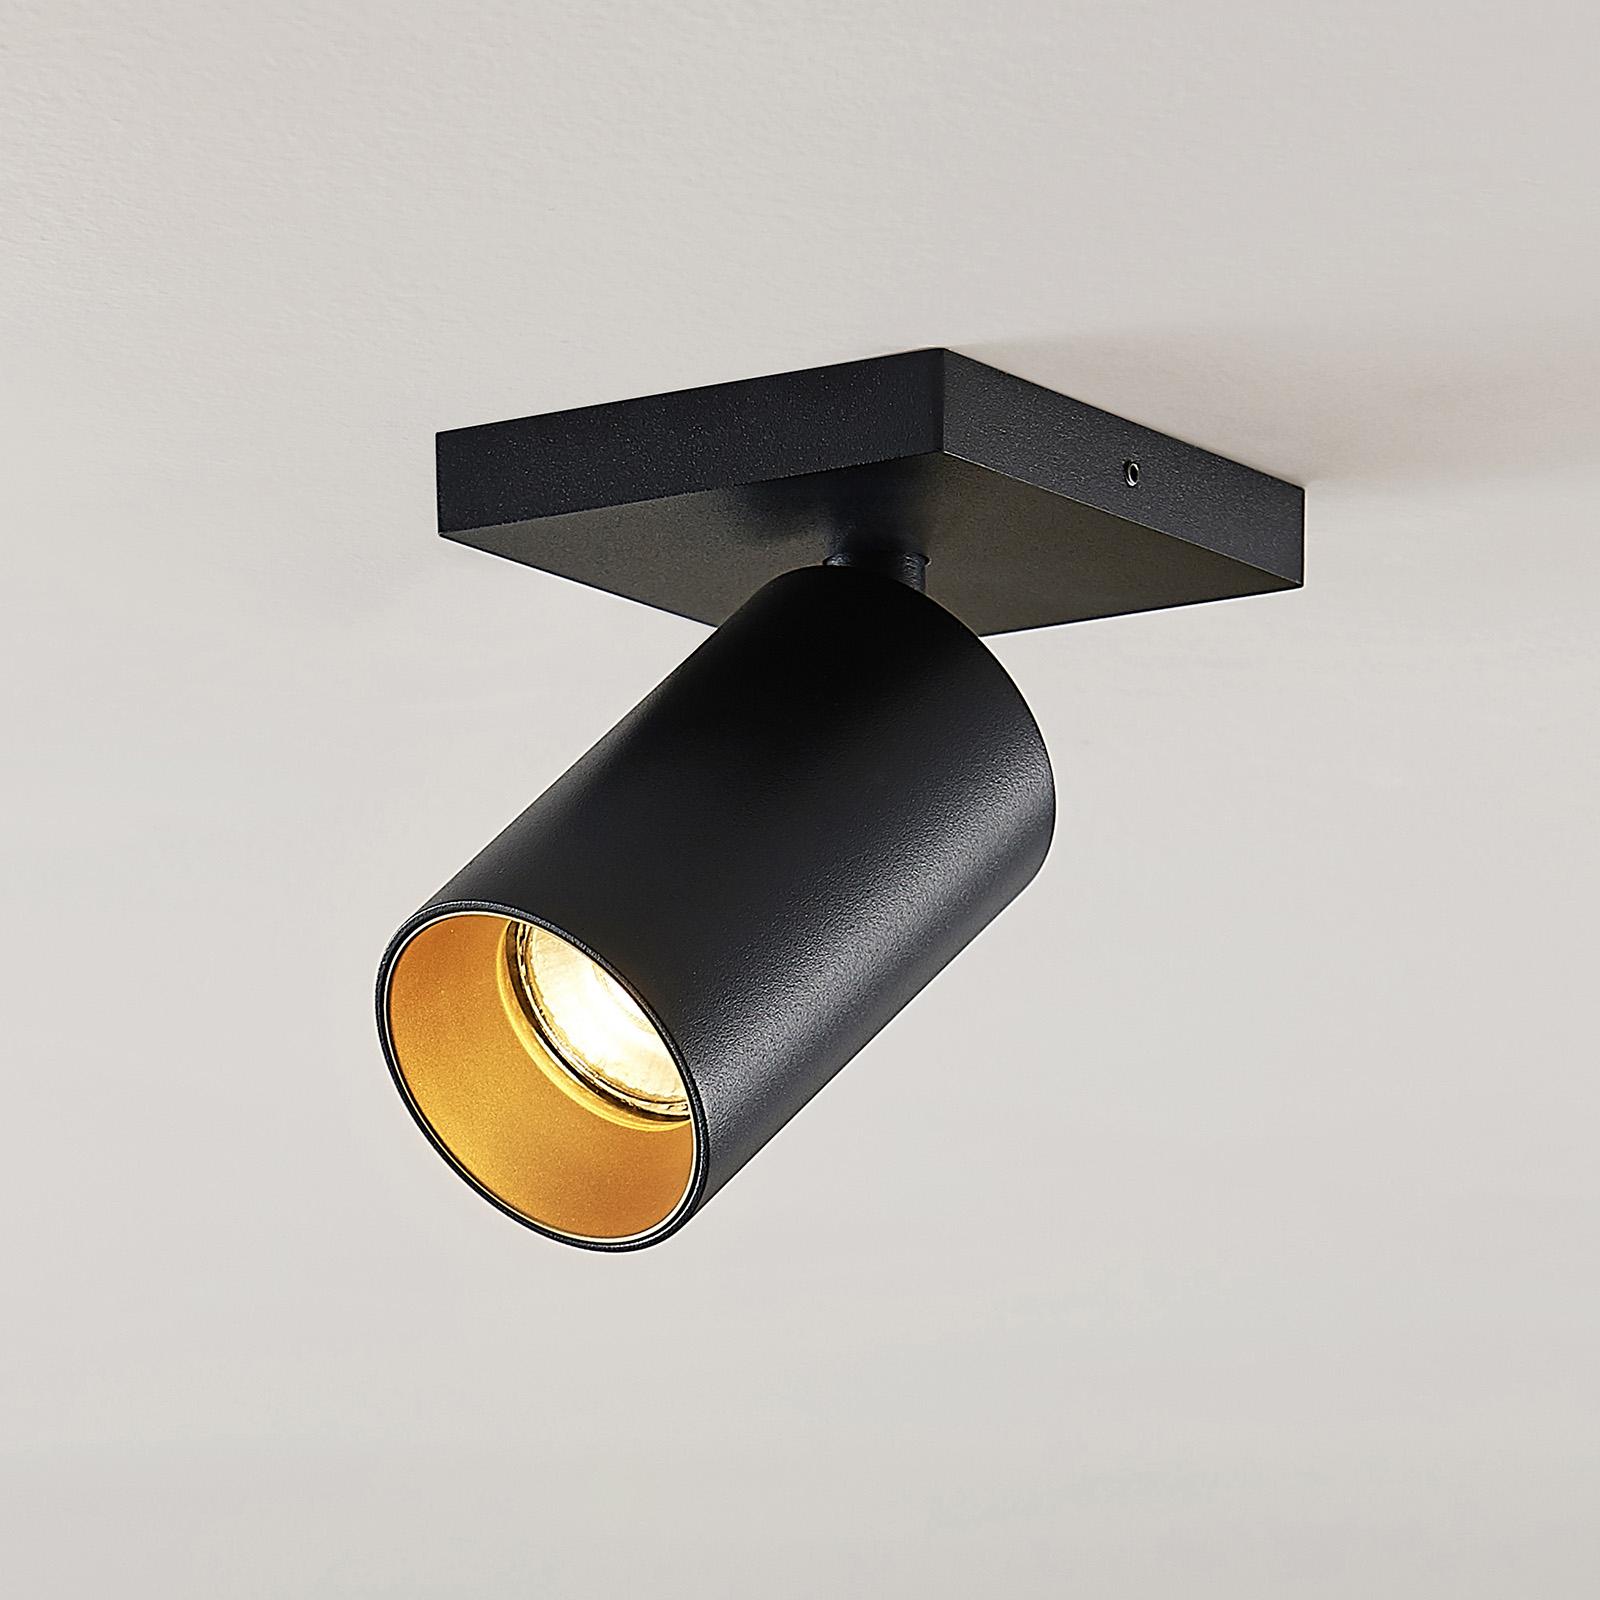 Kohdevalo Brinja GU10 musta 1 lamppu kulmikas